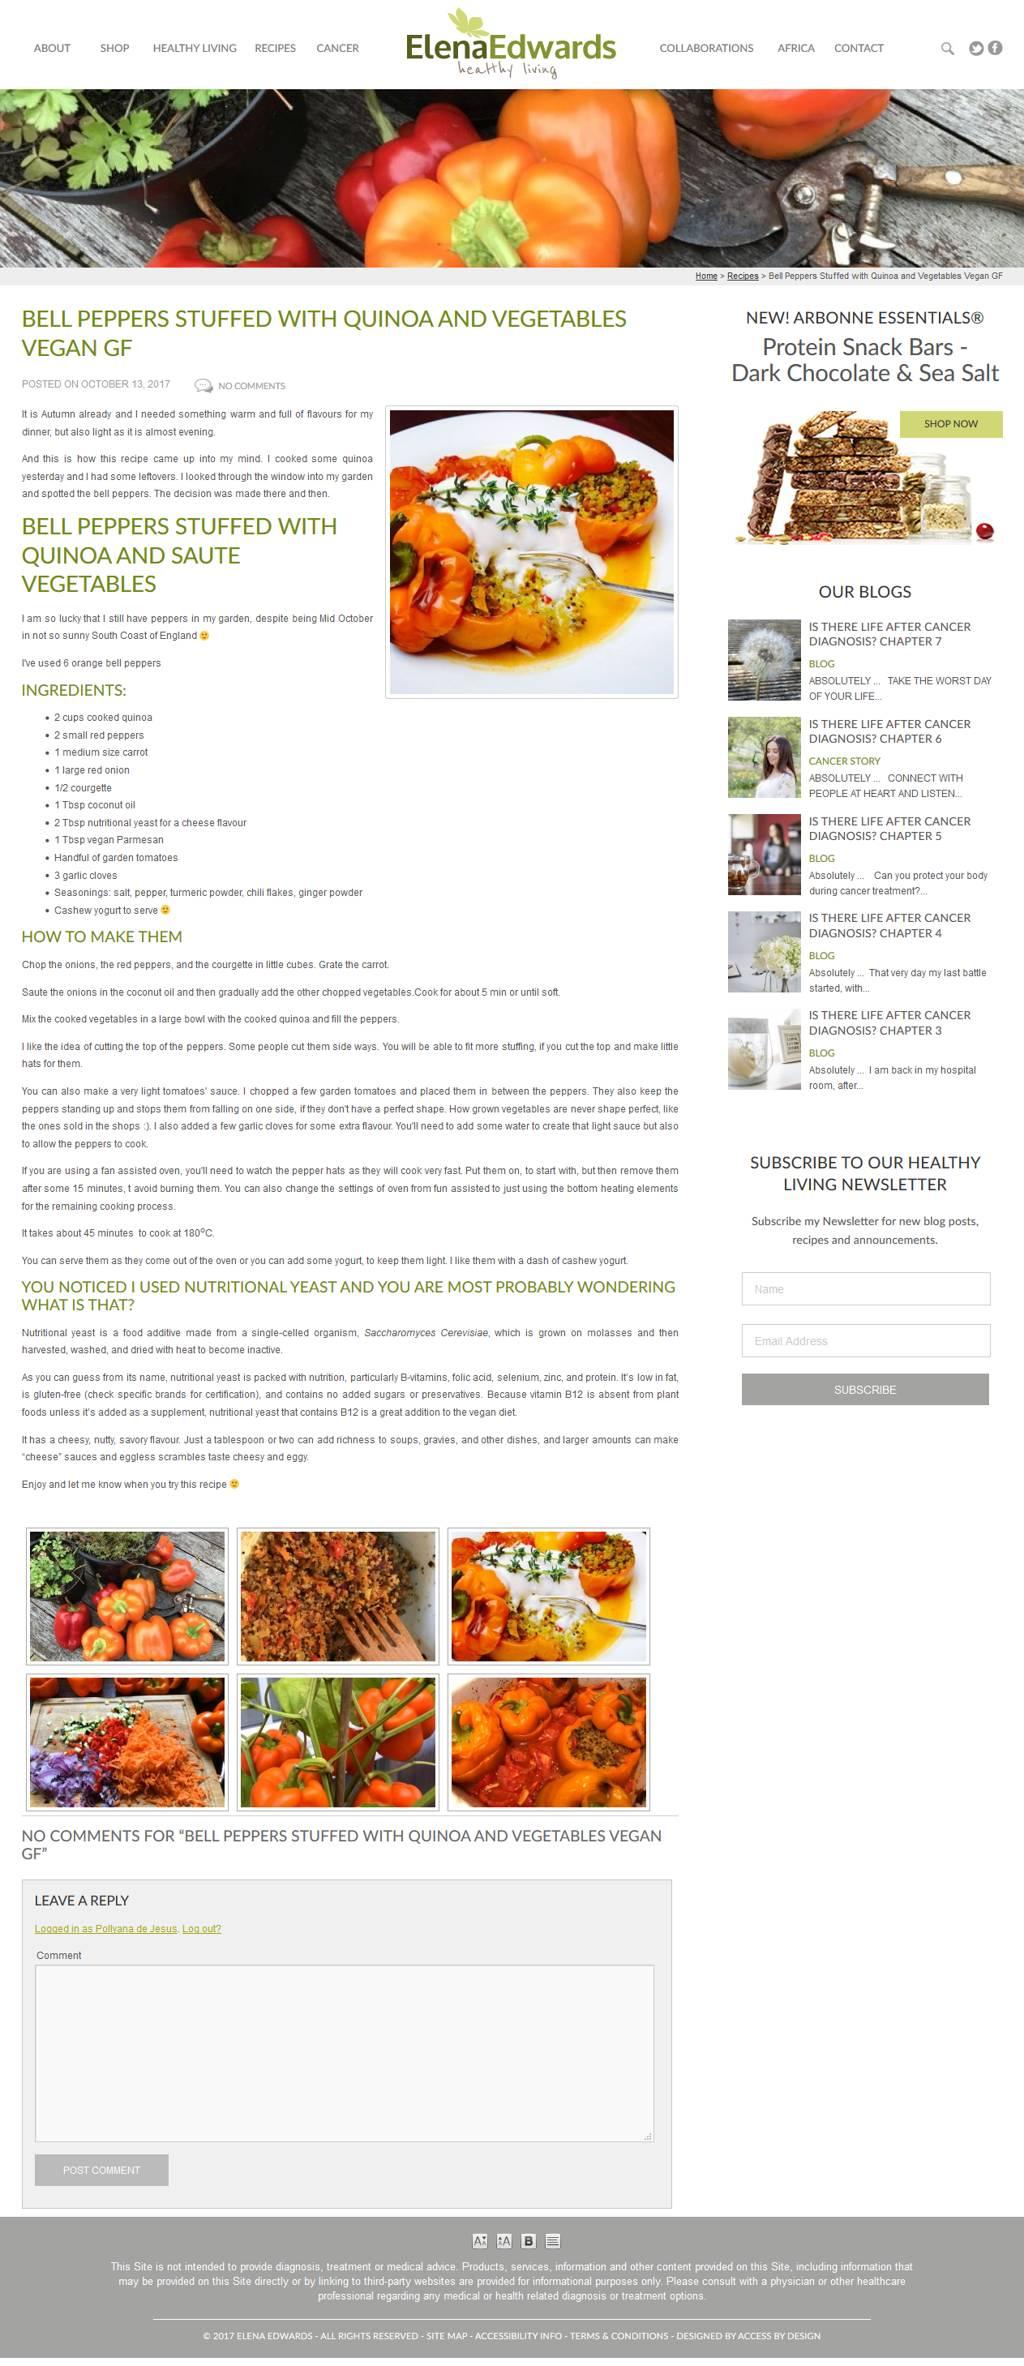 elenaedwards.com screenshot by Access by Design 01243 776399